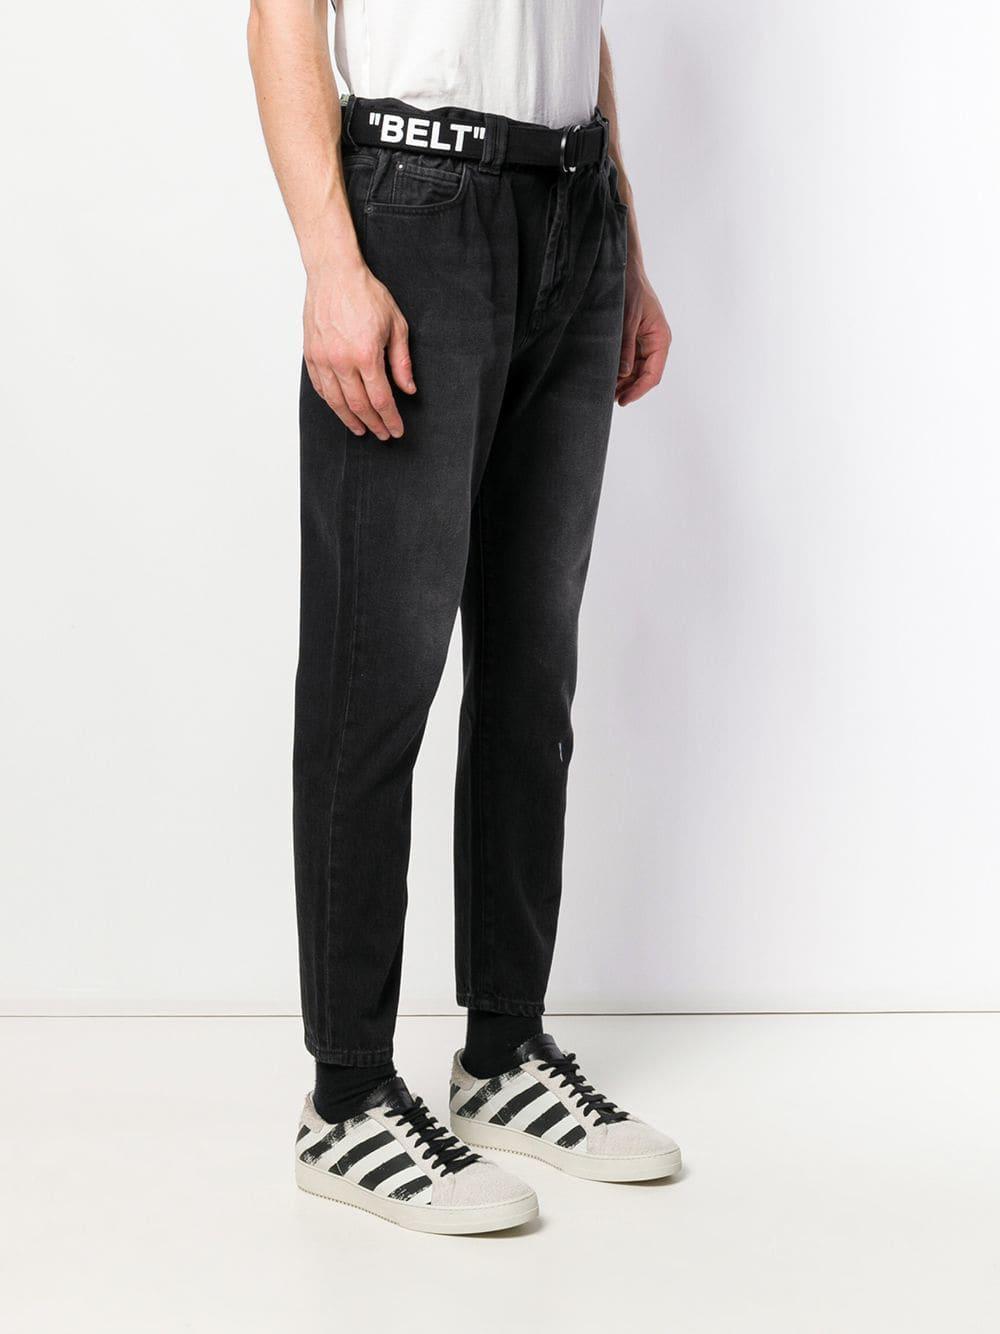 Off-White c/o Virgil Abloh Denim Tapered Jeans in het Zwart voor heren